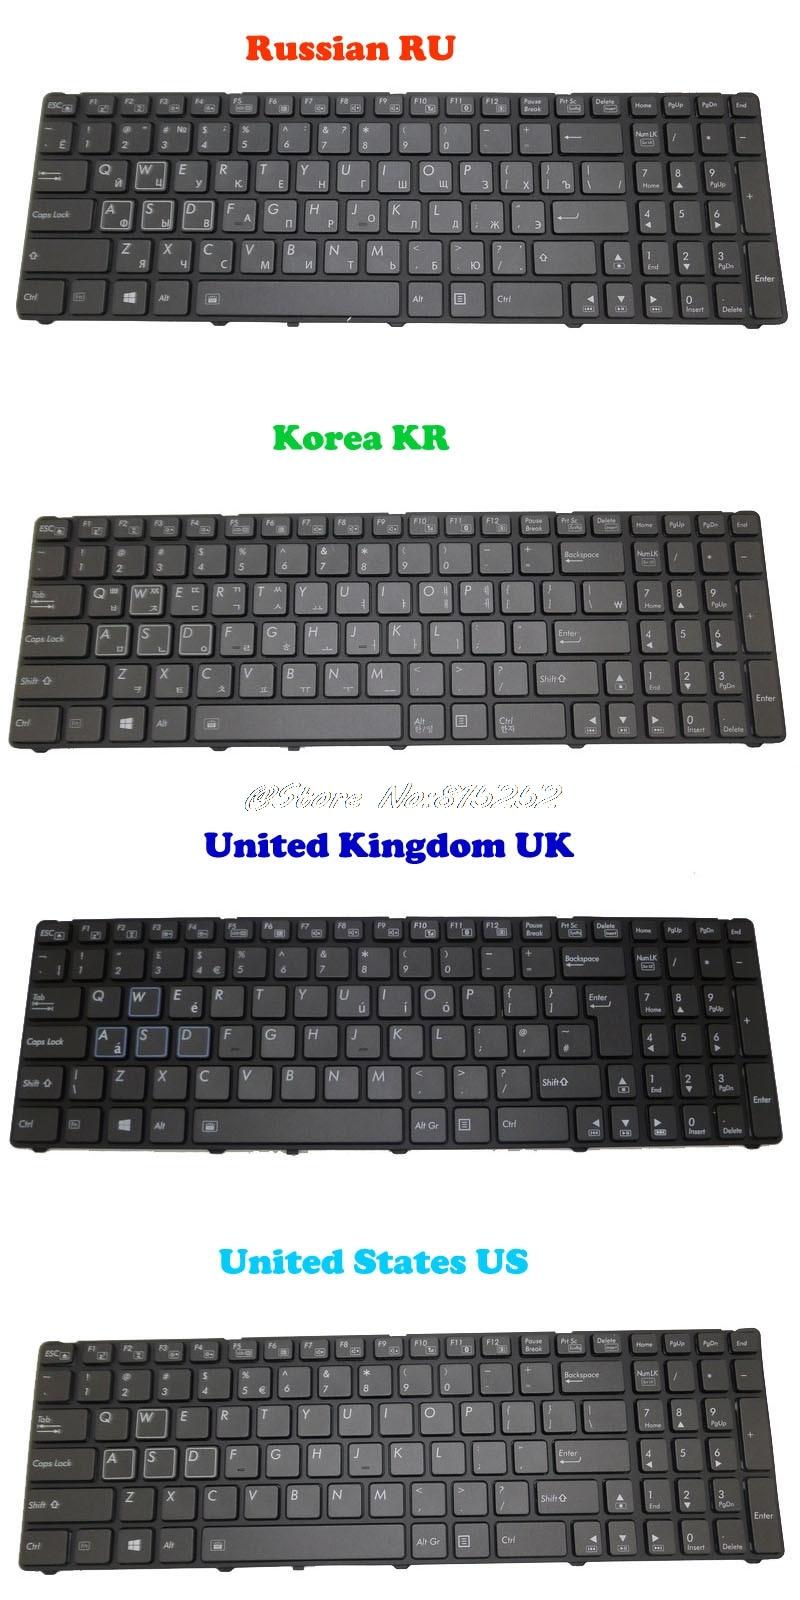 Backlit Keyboard For Gigabyte P25K P25W V2 P25W-CF1 P25W-CF2 P25W-CF3 P25X V2 P25K-CF2 V111465ES1 Korea KR Russian RU English UK laptop parts for lenovo yoga 2 13 yoga2 13 black palmrest with backlit russian ru keyboard 90205170